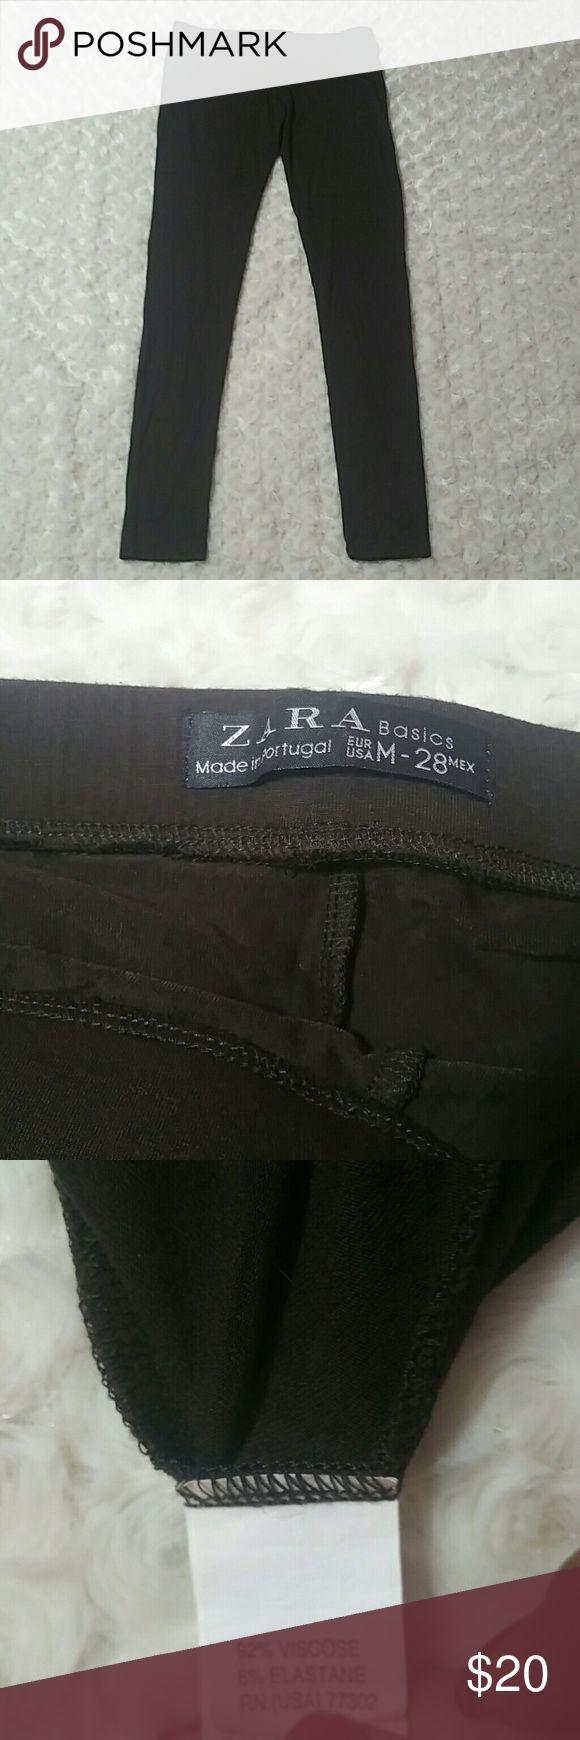 "Zara Chocolate Brown Basic Leggings Medium Excellent condition - no piling or signs of wear whatsoever - 92% viscose - 8% elastane - chocolate brown - size medium - 27.25"" inseam Zara Pants Leggings"